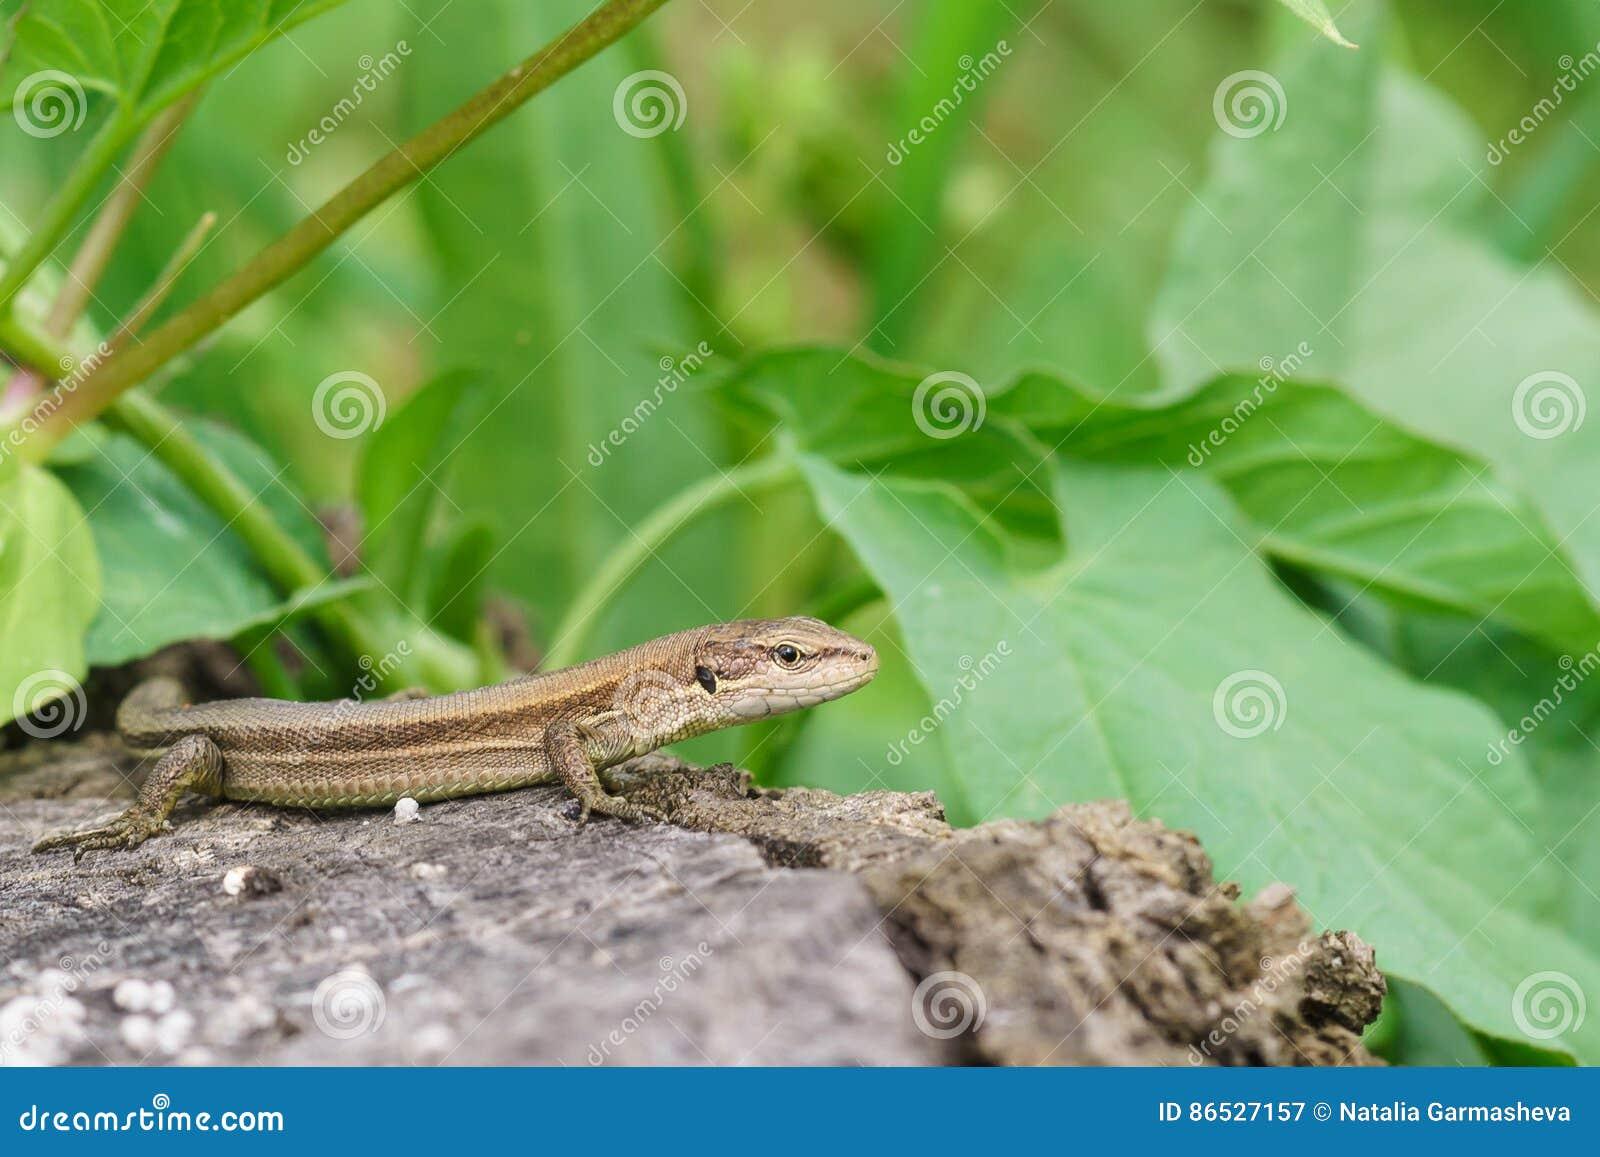 Pontic lizard Darevskia pontica Rock lizards sits on an old stump